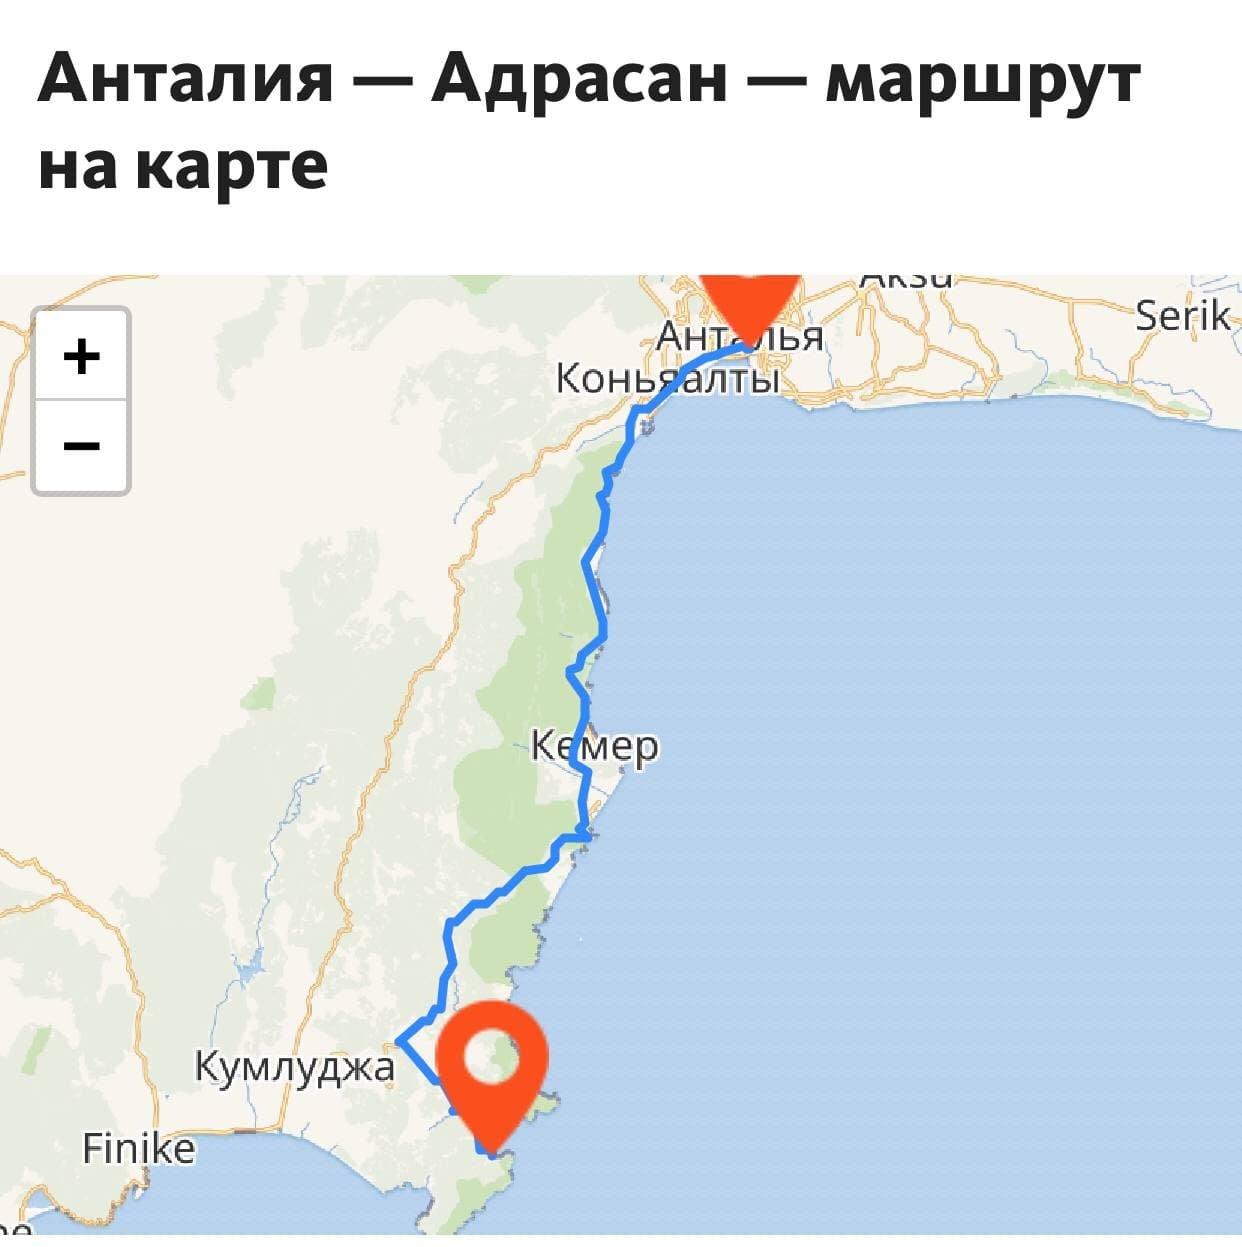 Расстояние от Анталии до посёлка Адрасан